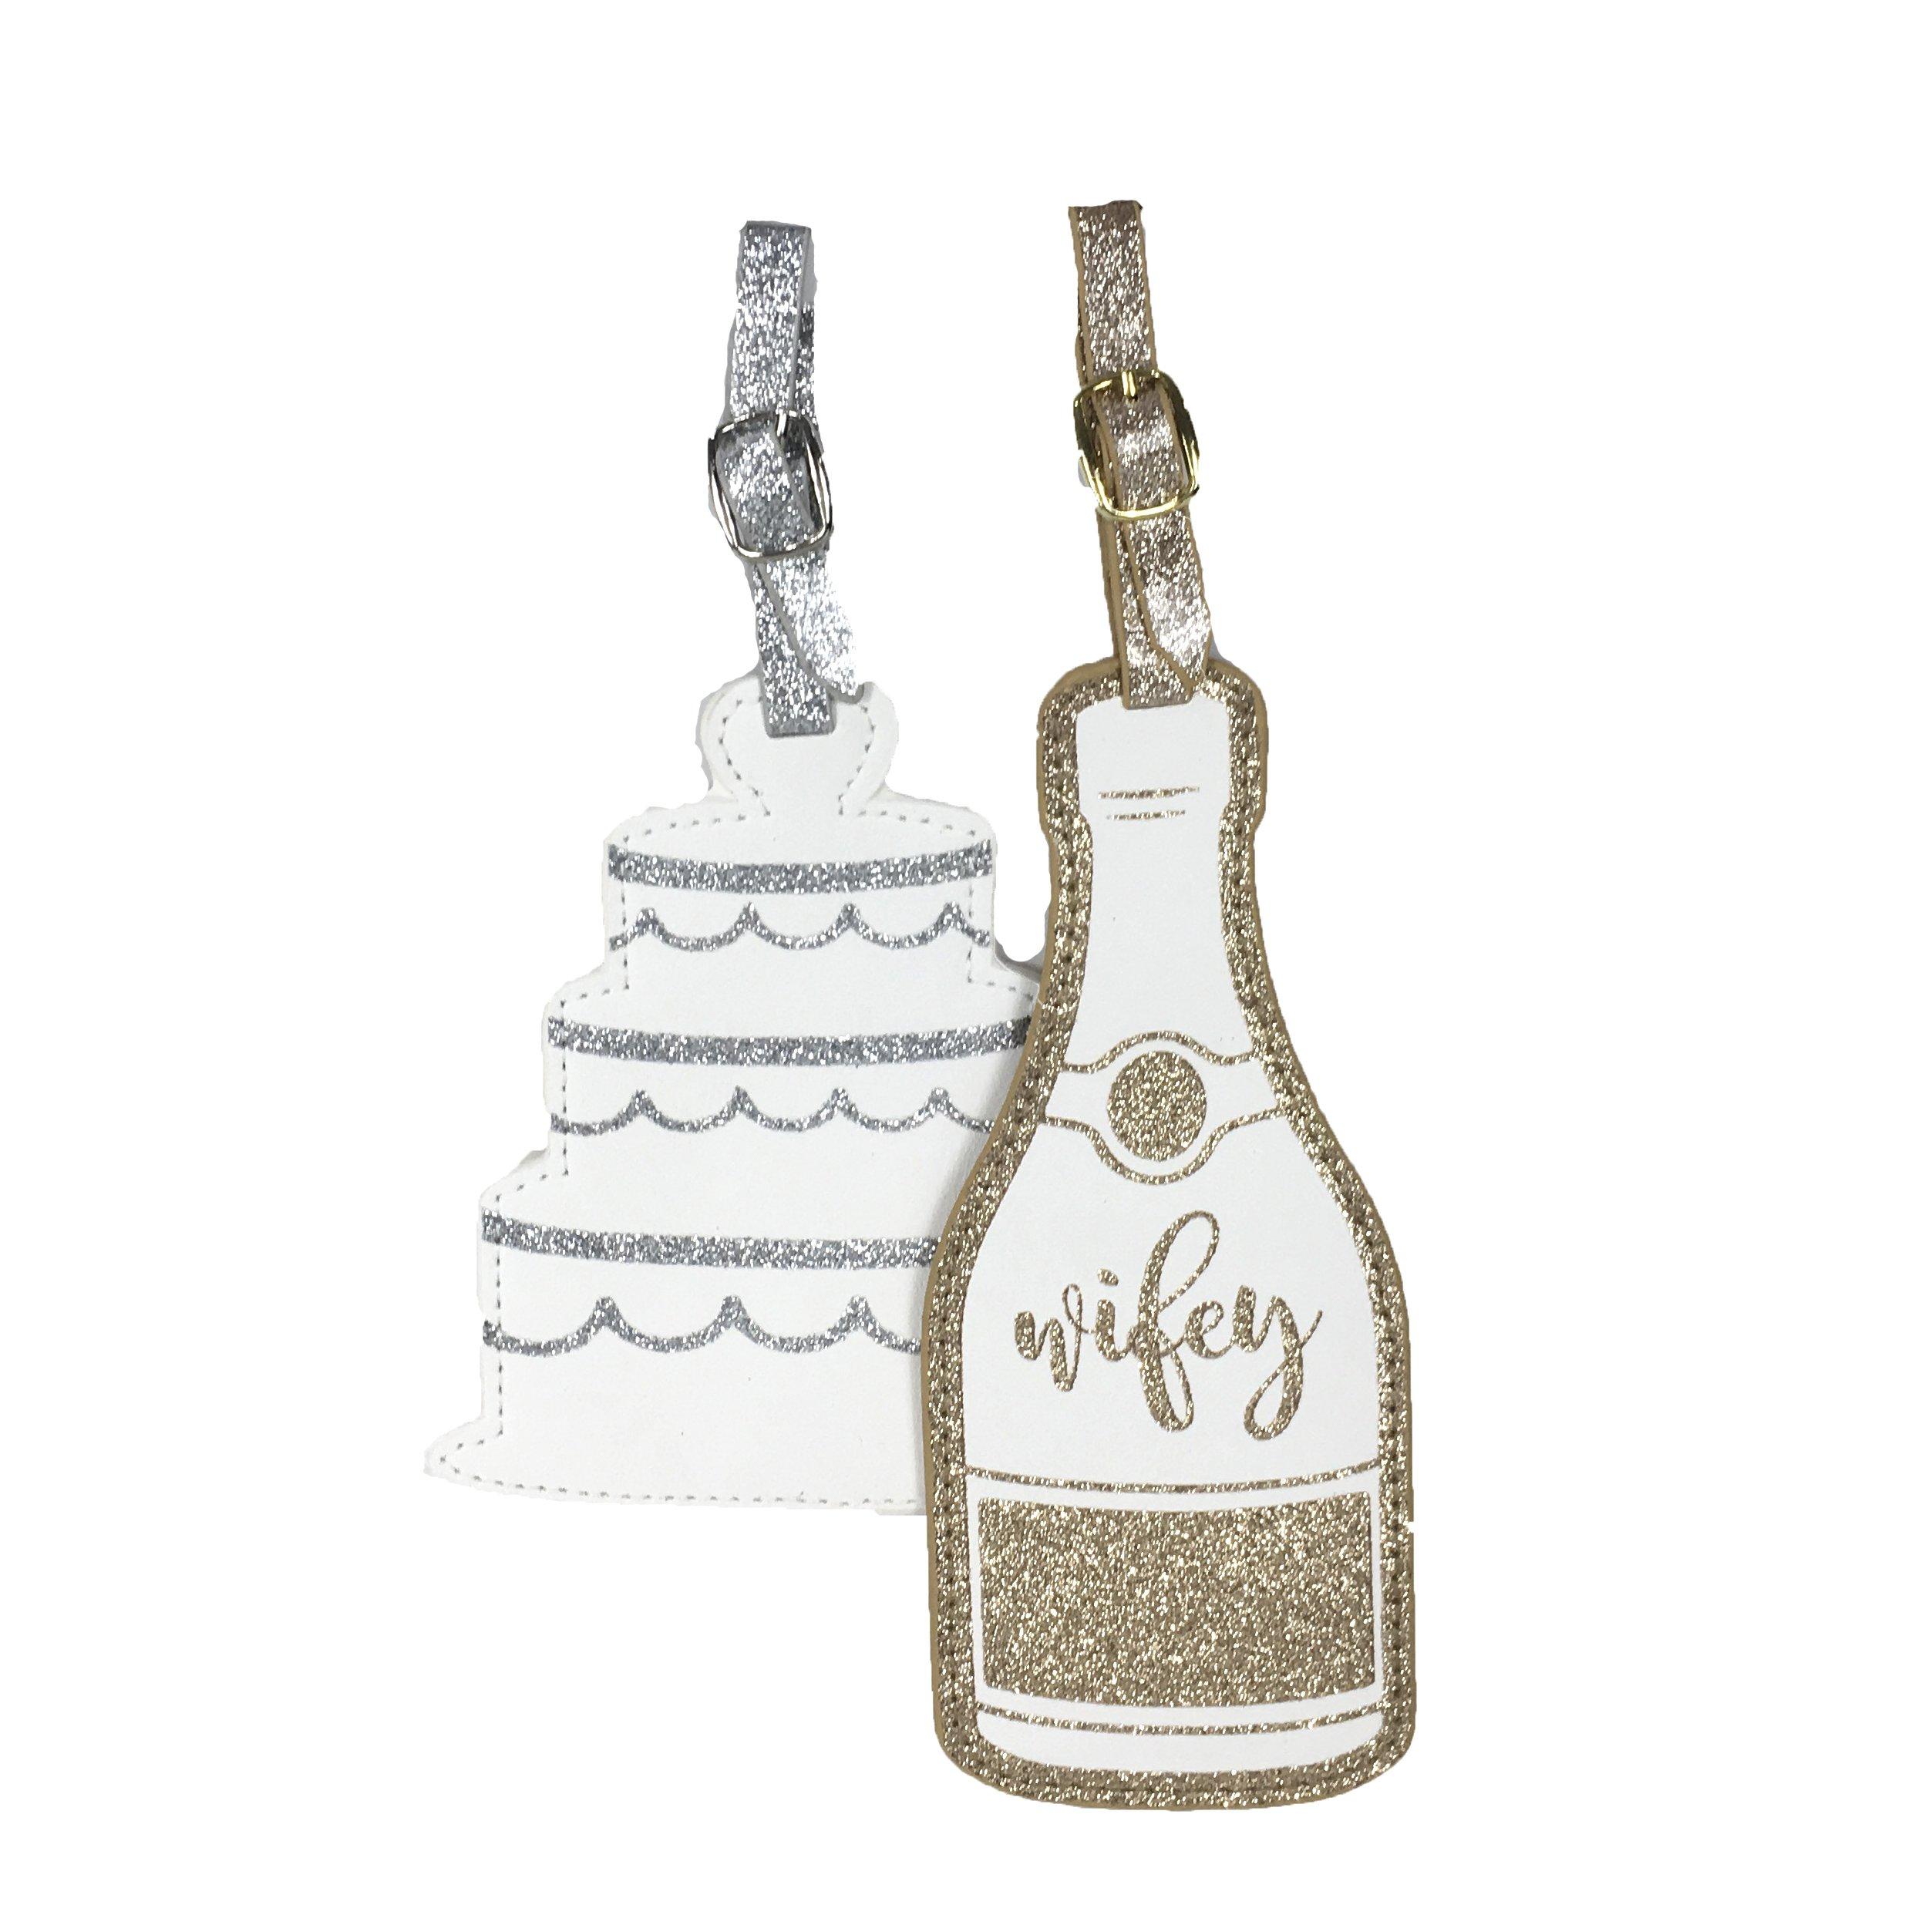 Sparkle Wifey & Wedding Cake Set of 2 Luggage Tags, Multi